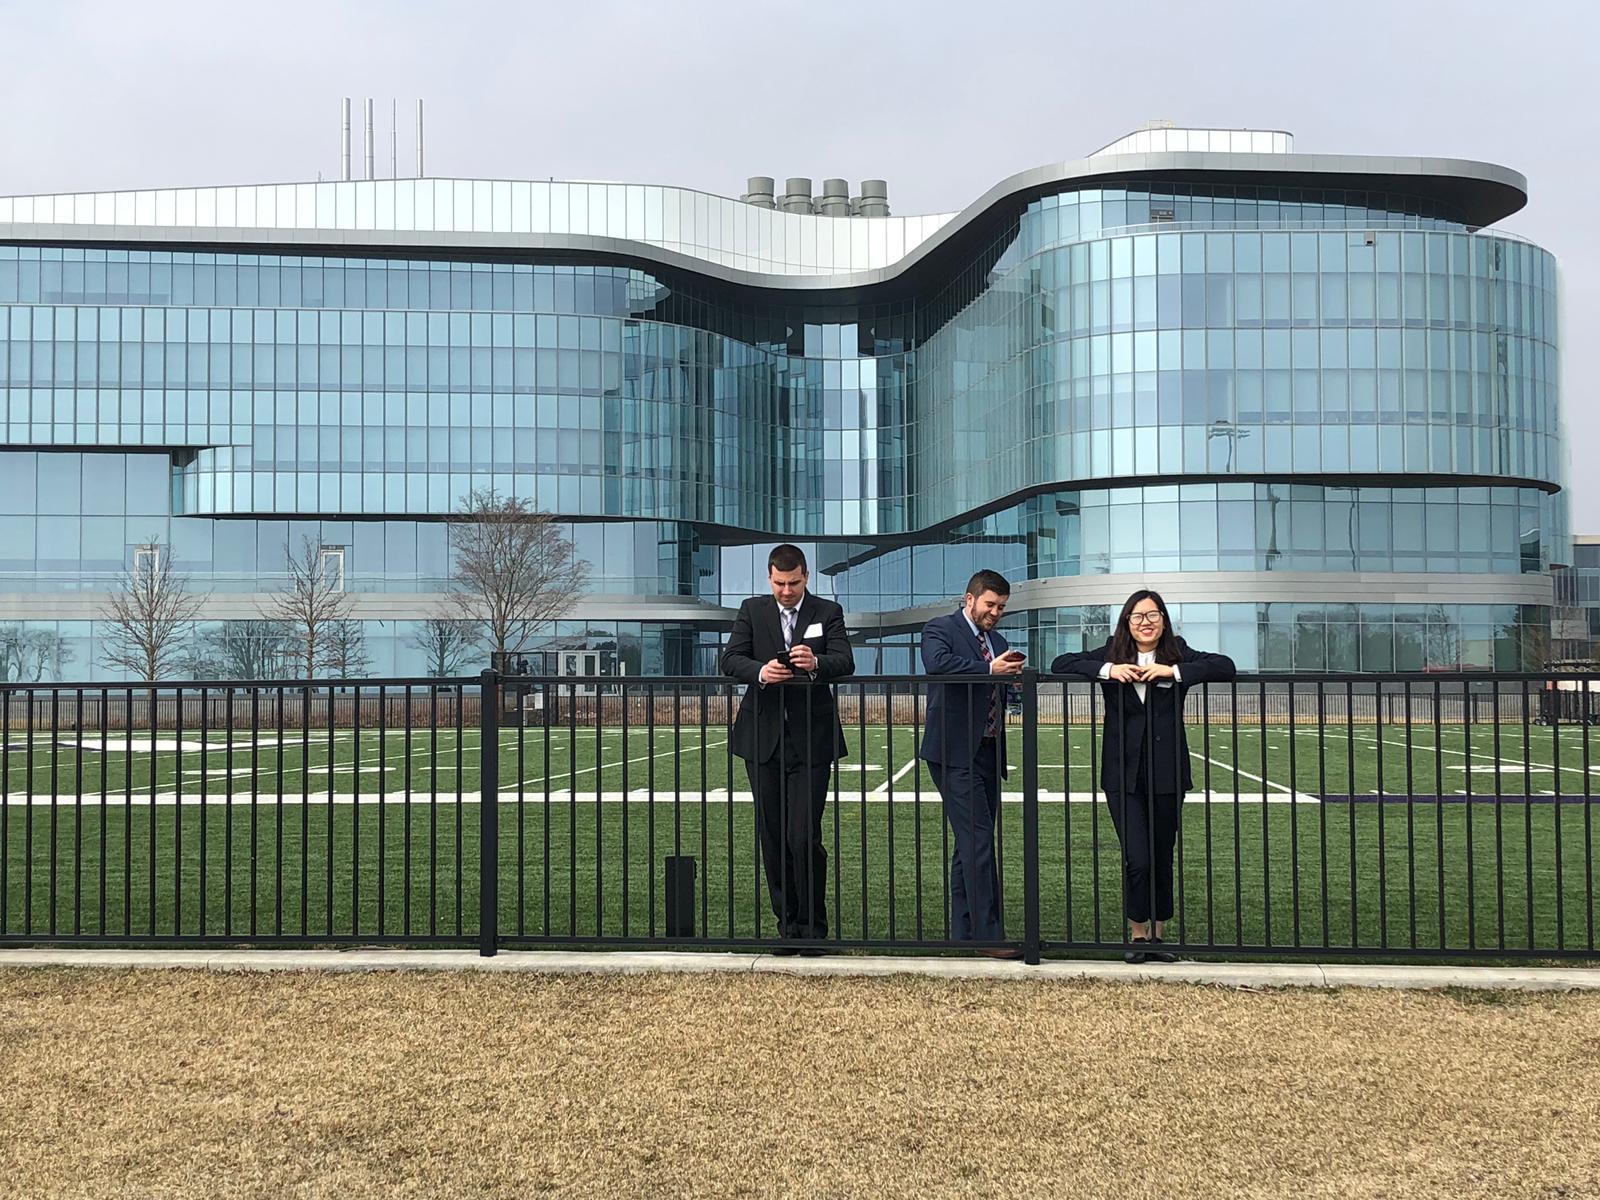 Kellogg MBA Building